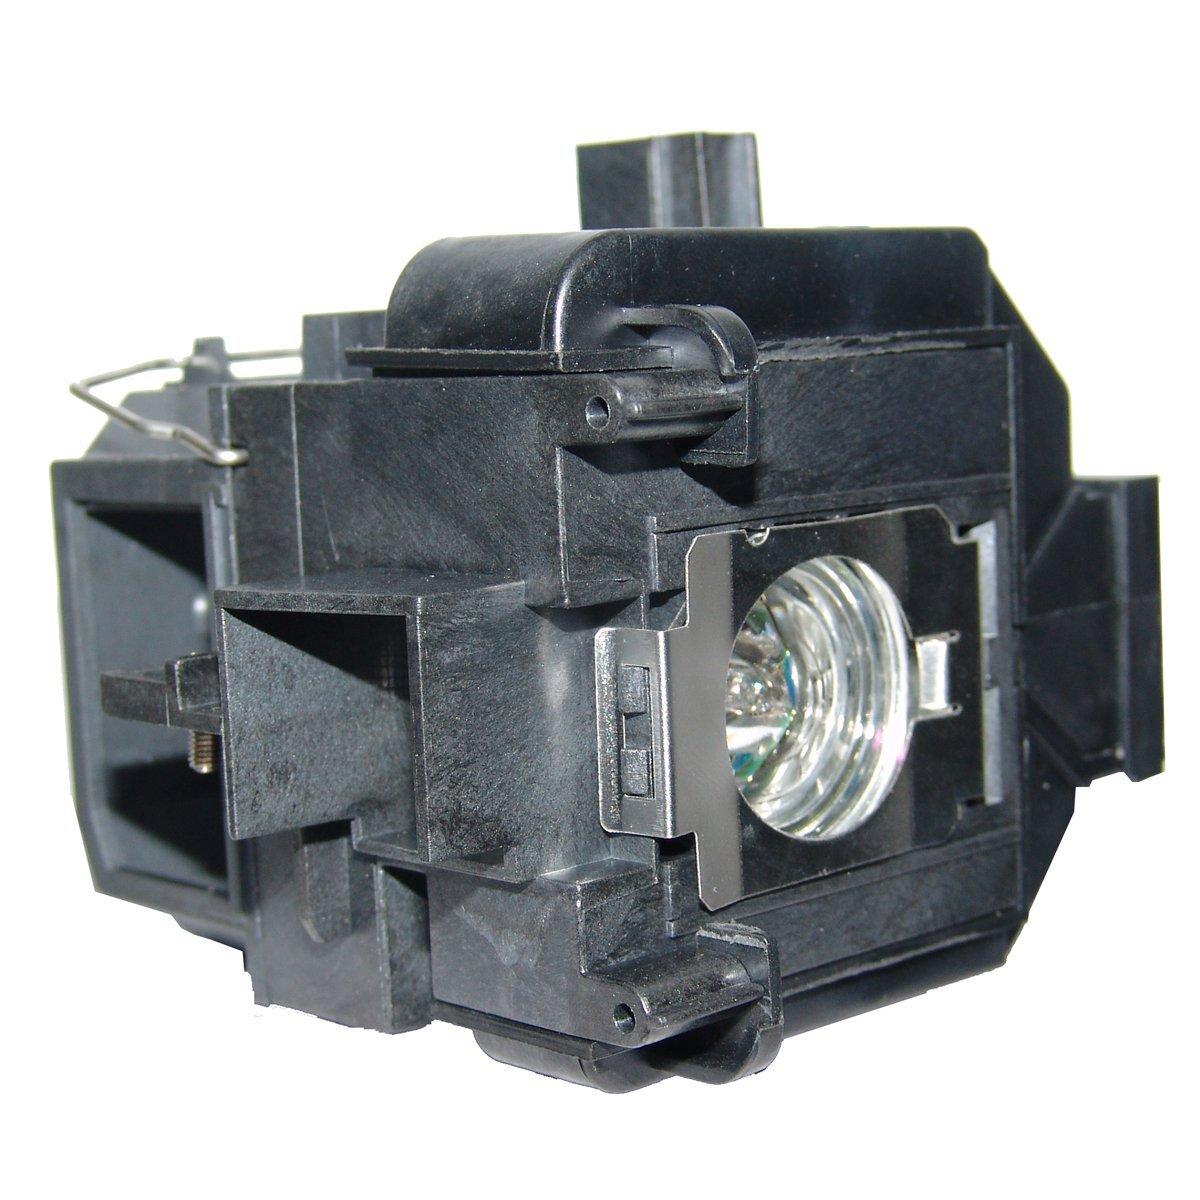 ELPLP69 V13H010L69 for Epson EH-TW8000 EH-TW9000 EH-TW9000W EH-TW9100/PowerLite Home Cinema HC5010 HC5020UB Projector Lamp Bulb<br>